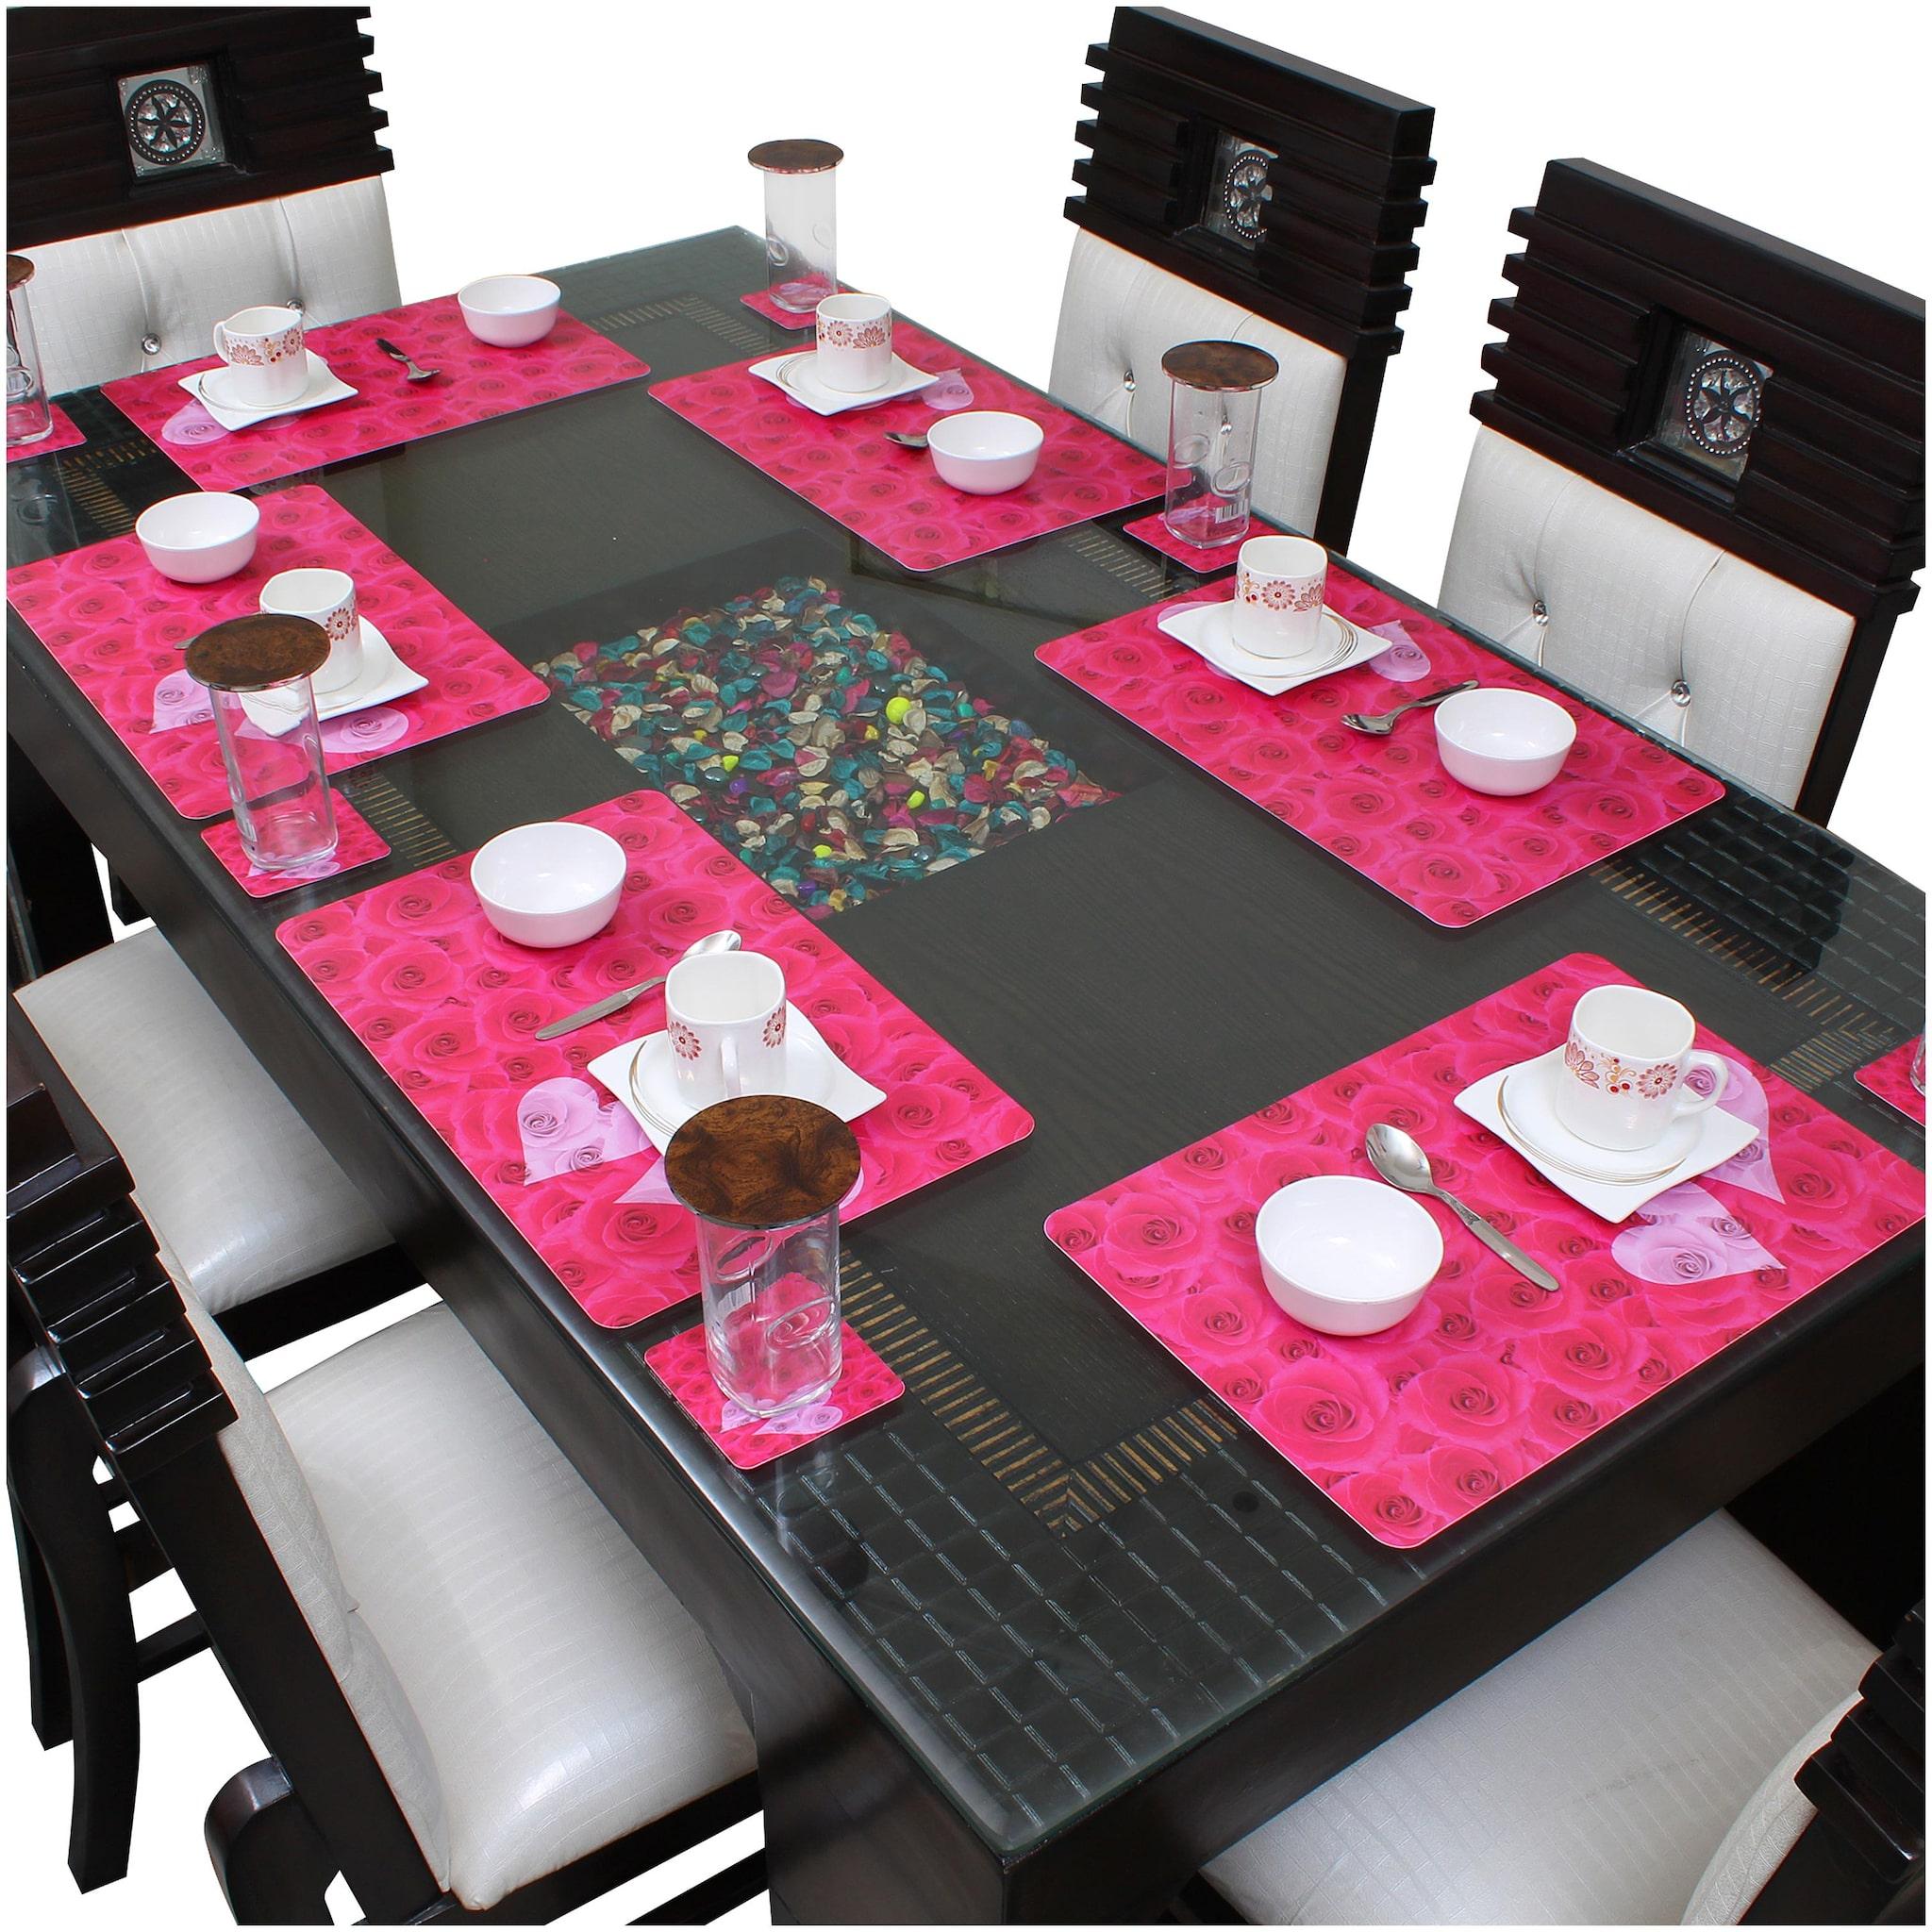 Dream Care Dining Table Placemats  6Pcs Mat + 6Pcs Coaster